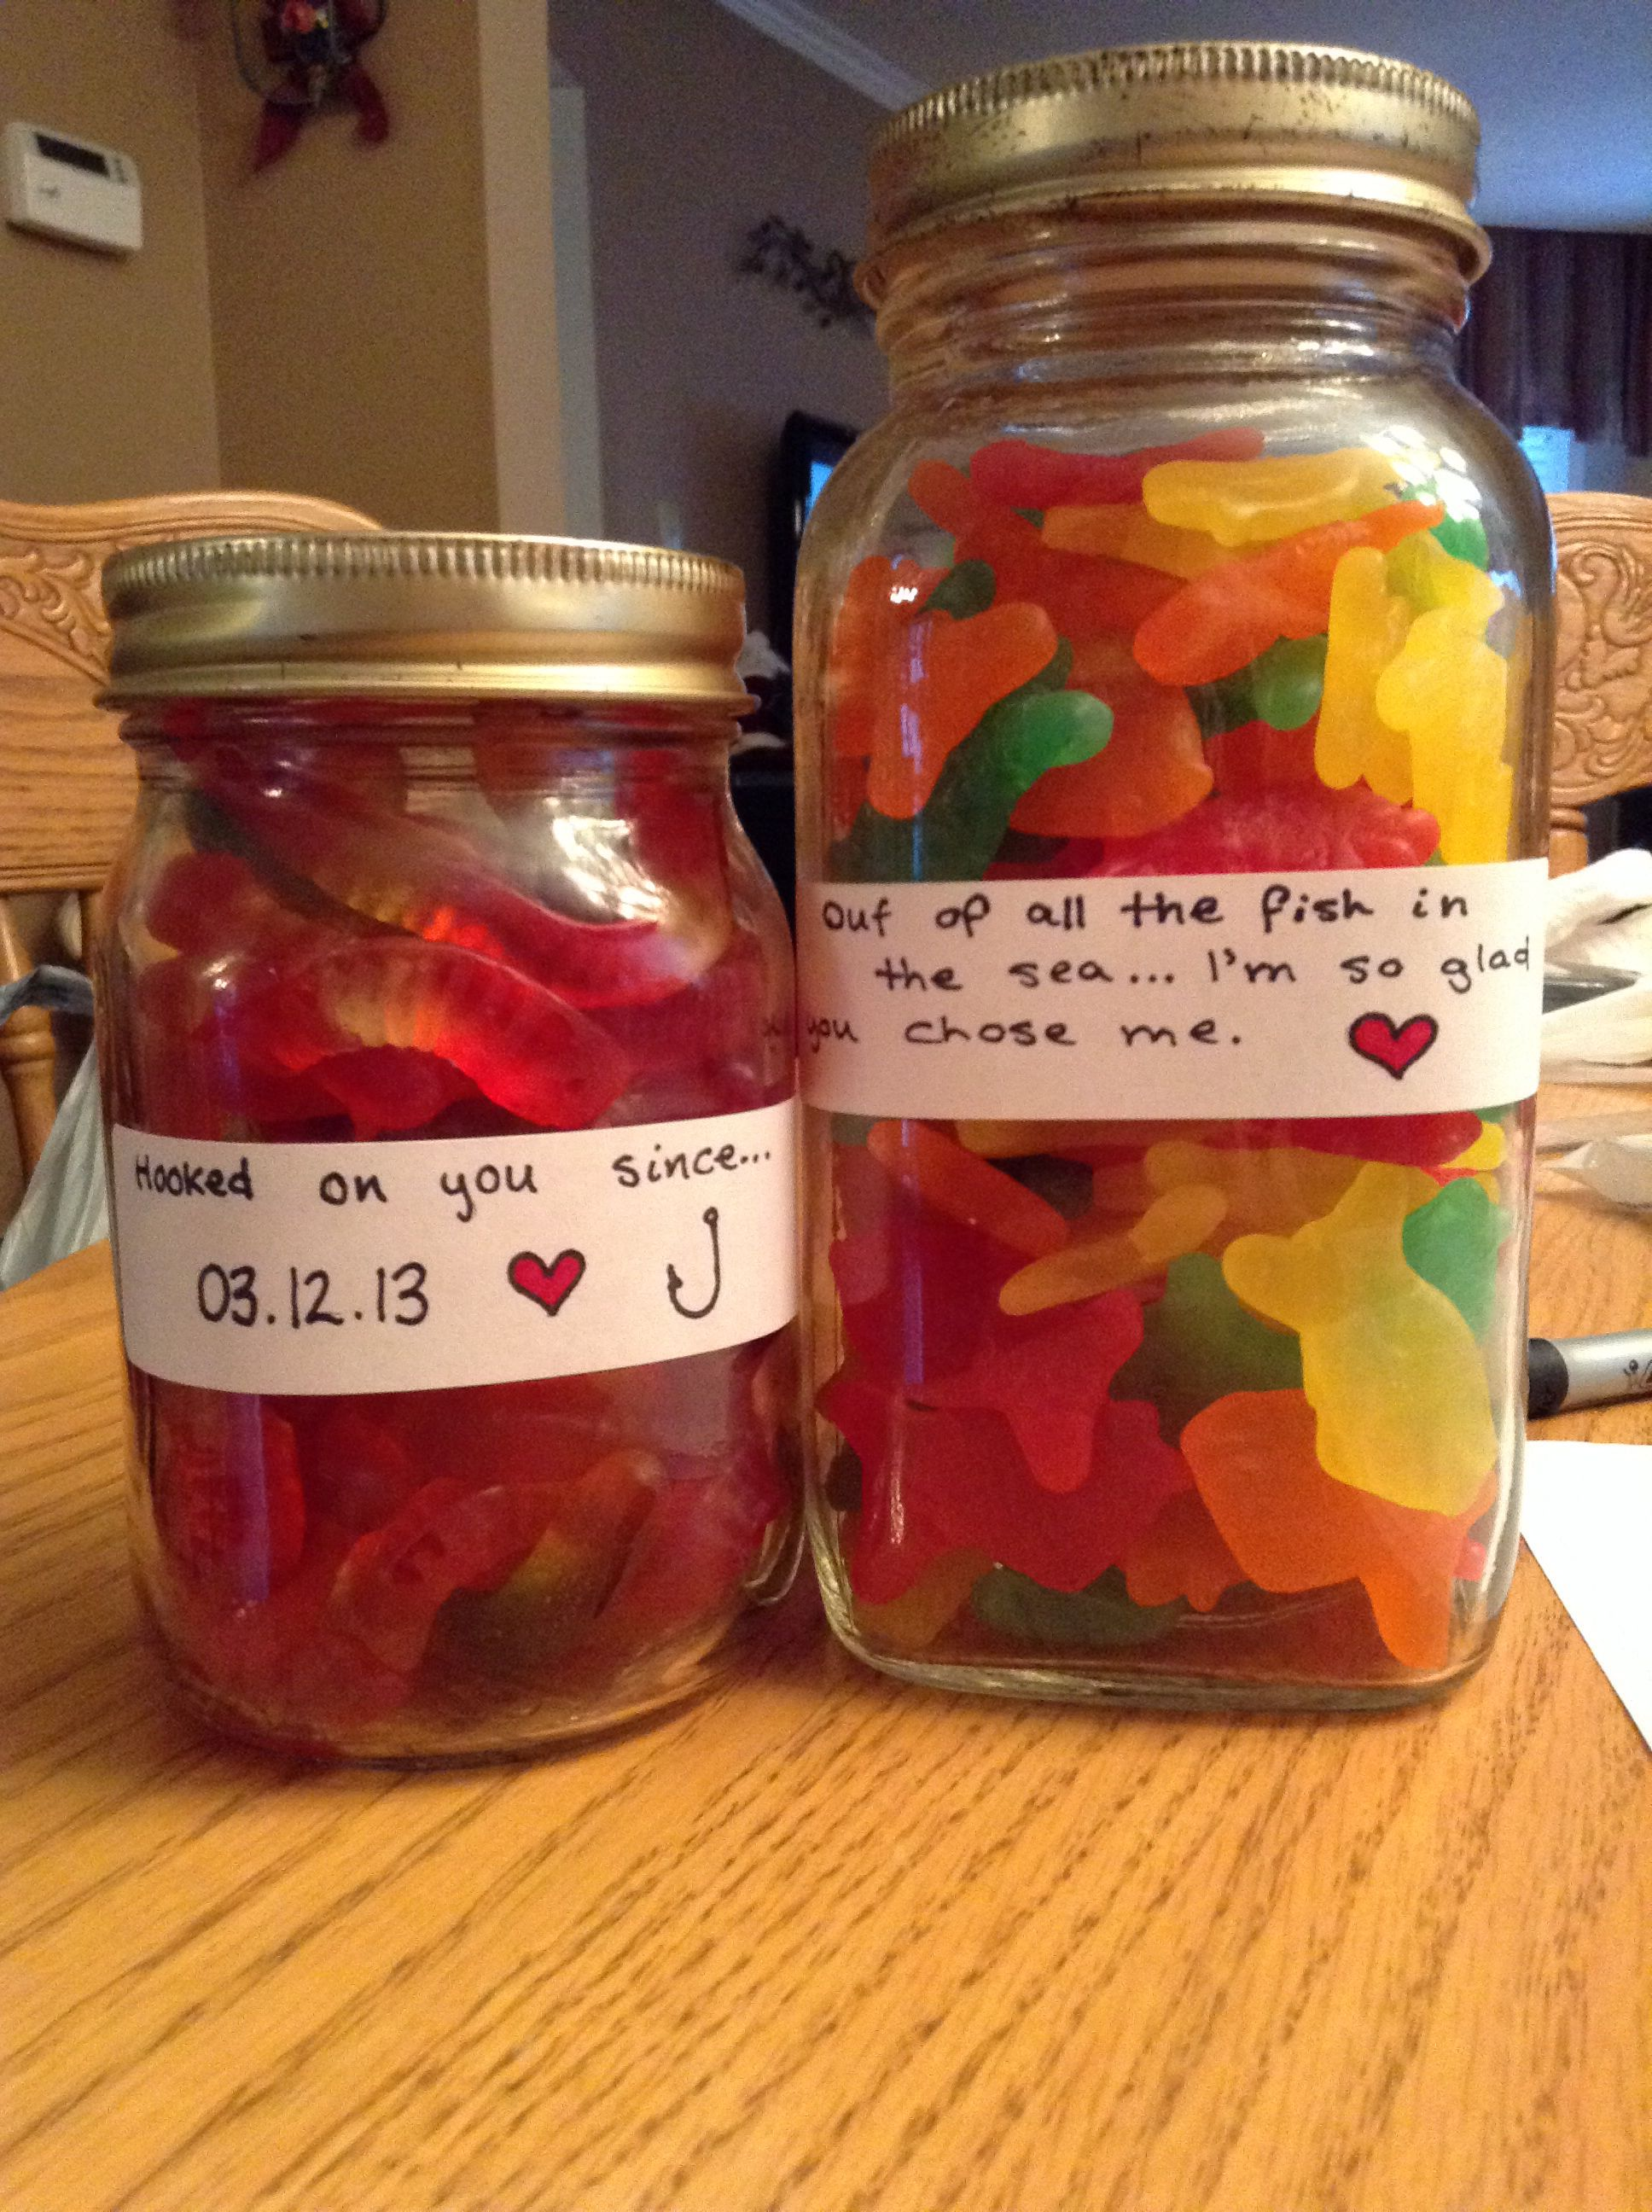 Pin by ashley kuhlman on girly things pinterest boyfriends jar